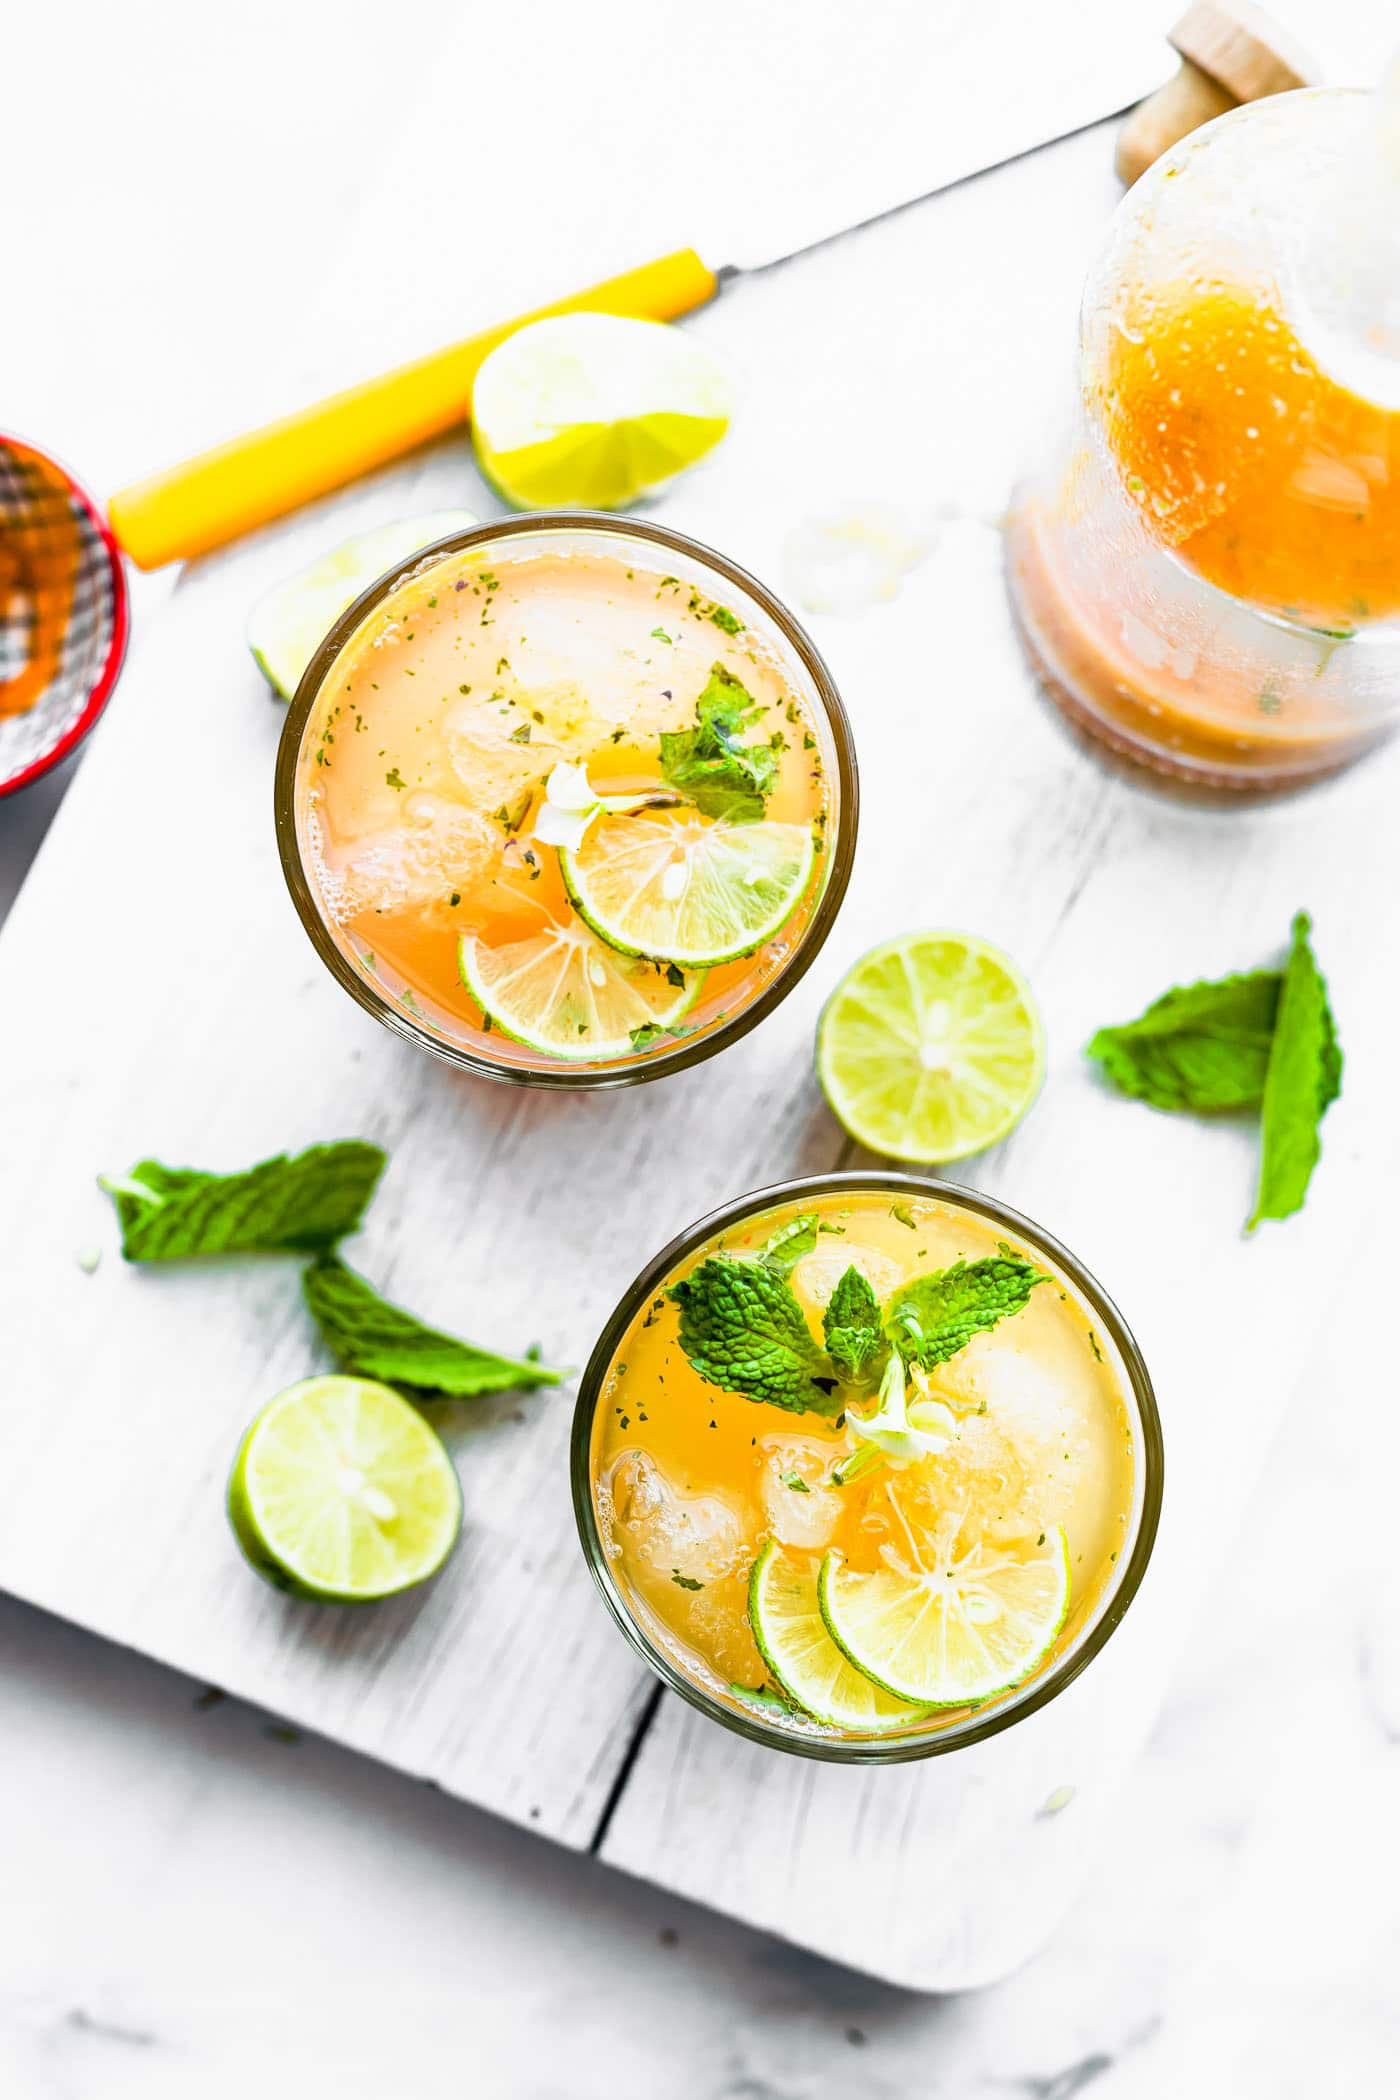 Drinking Apple Cider Vinegar in a Detox Morning Cocktail